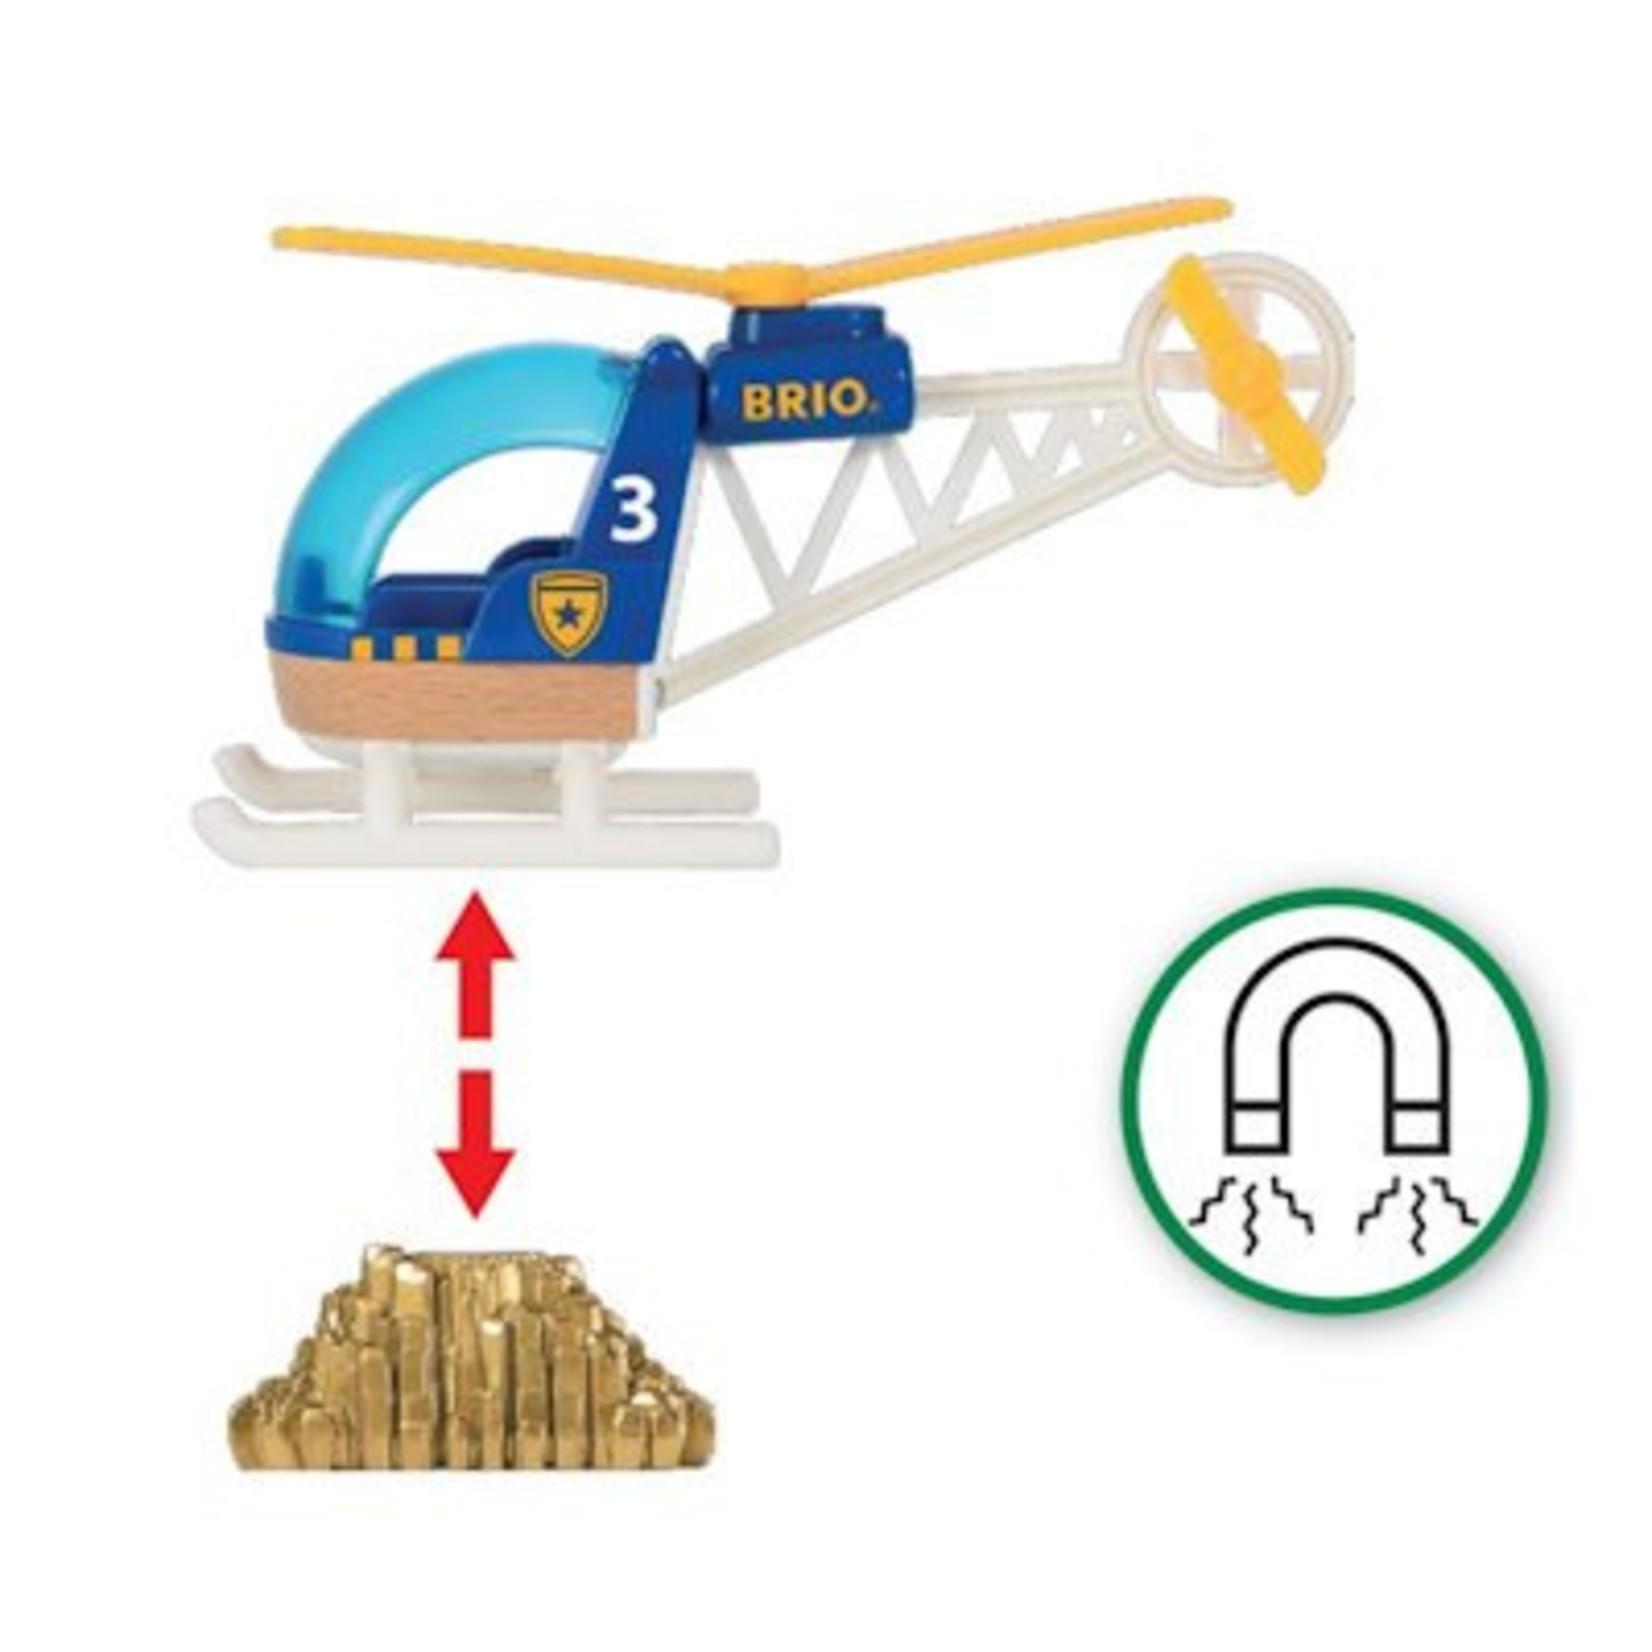 Brio Politie Helicopter